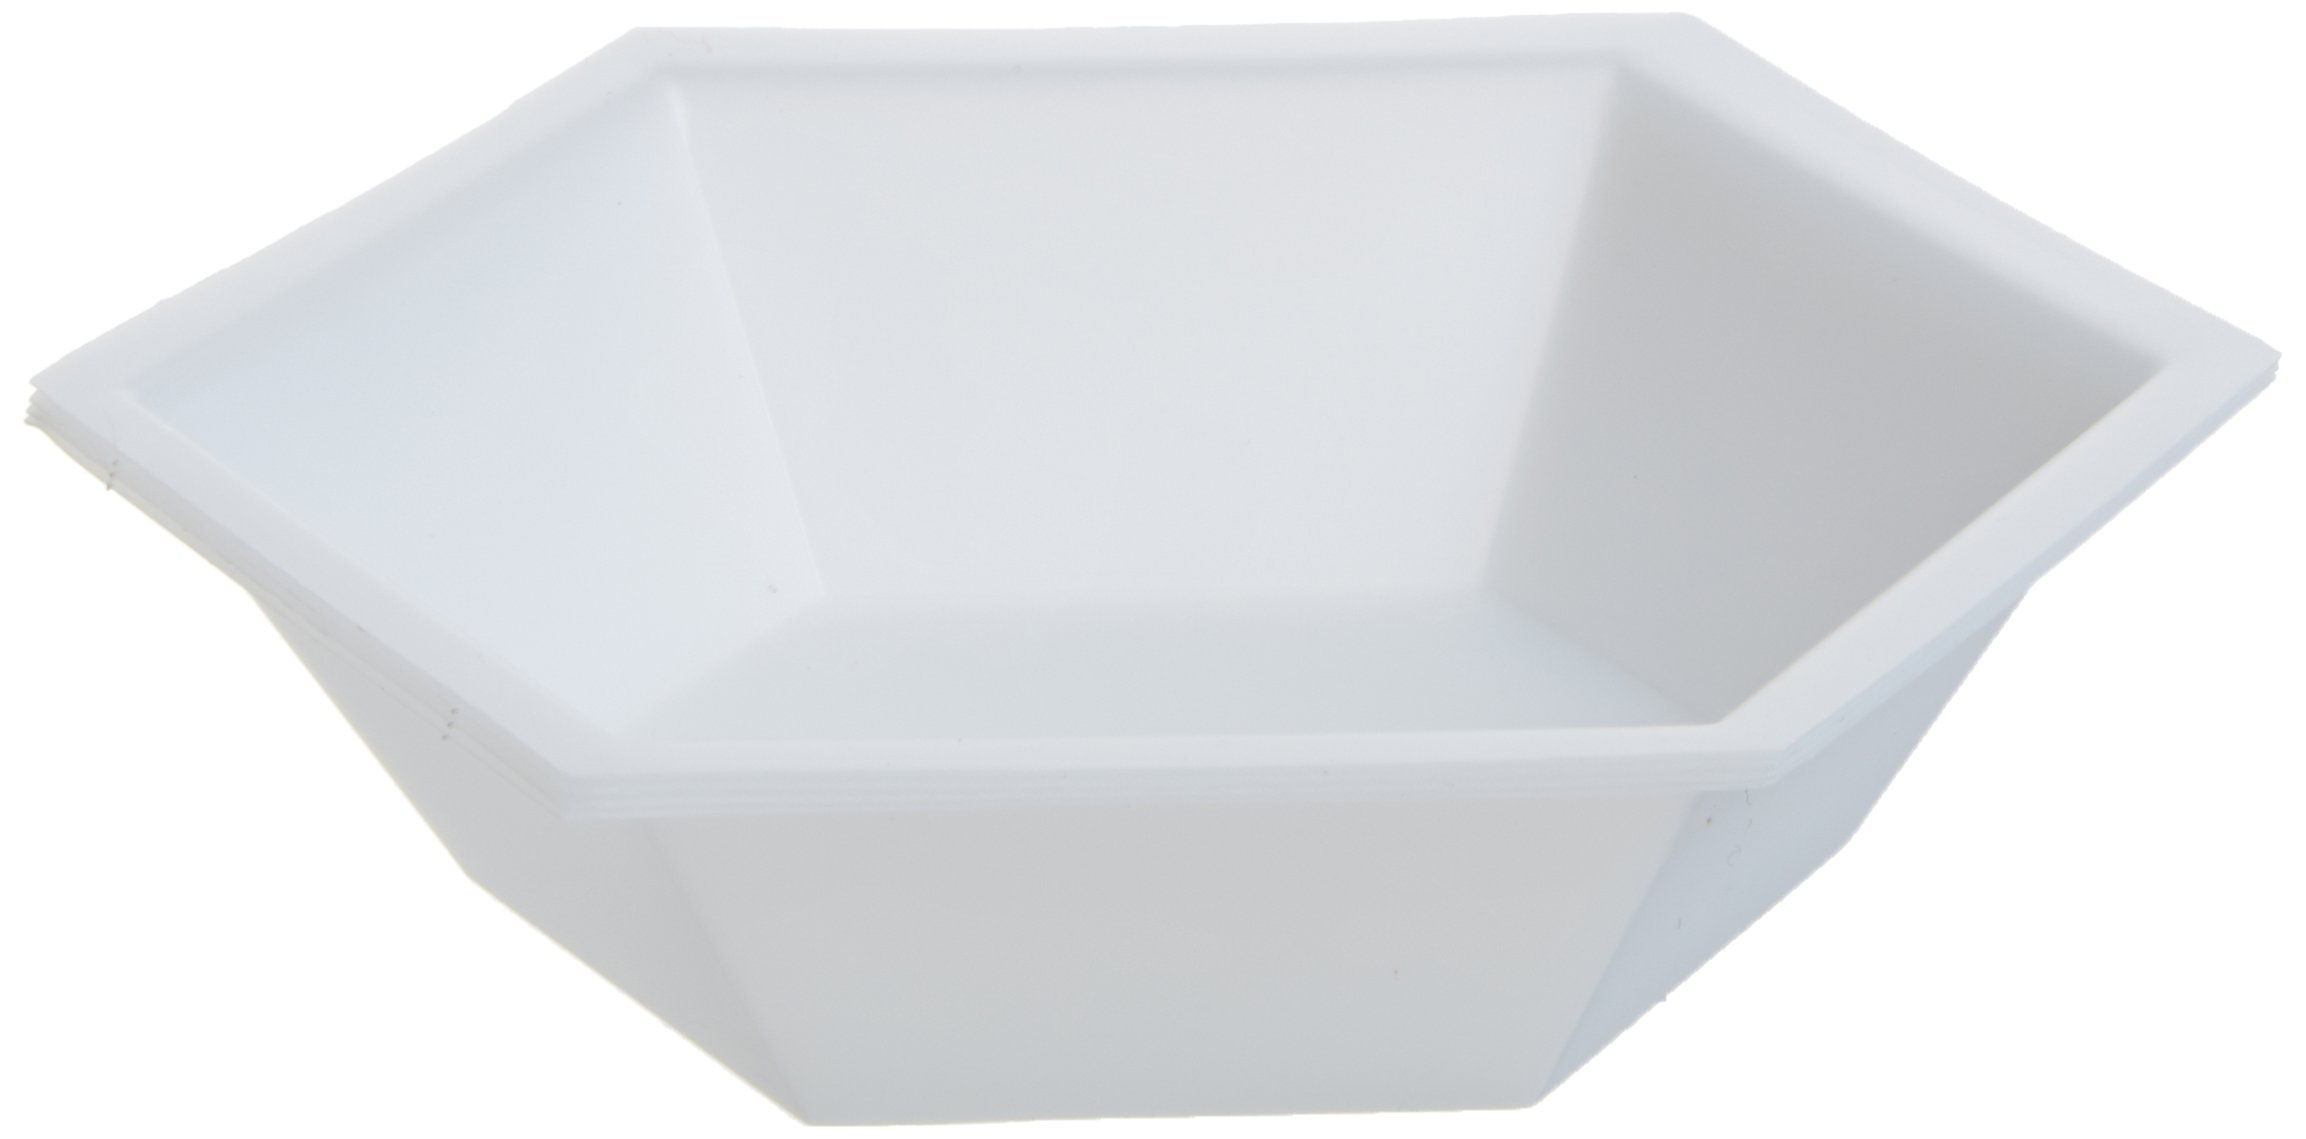 GMP Sales HEXWB-50 Polystyrene Hexagonal Weigh Boat, 40ml Capacity (Case of 500)